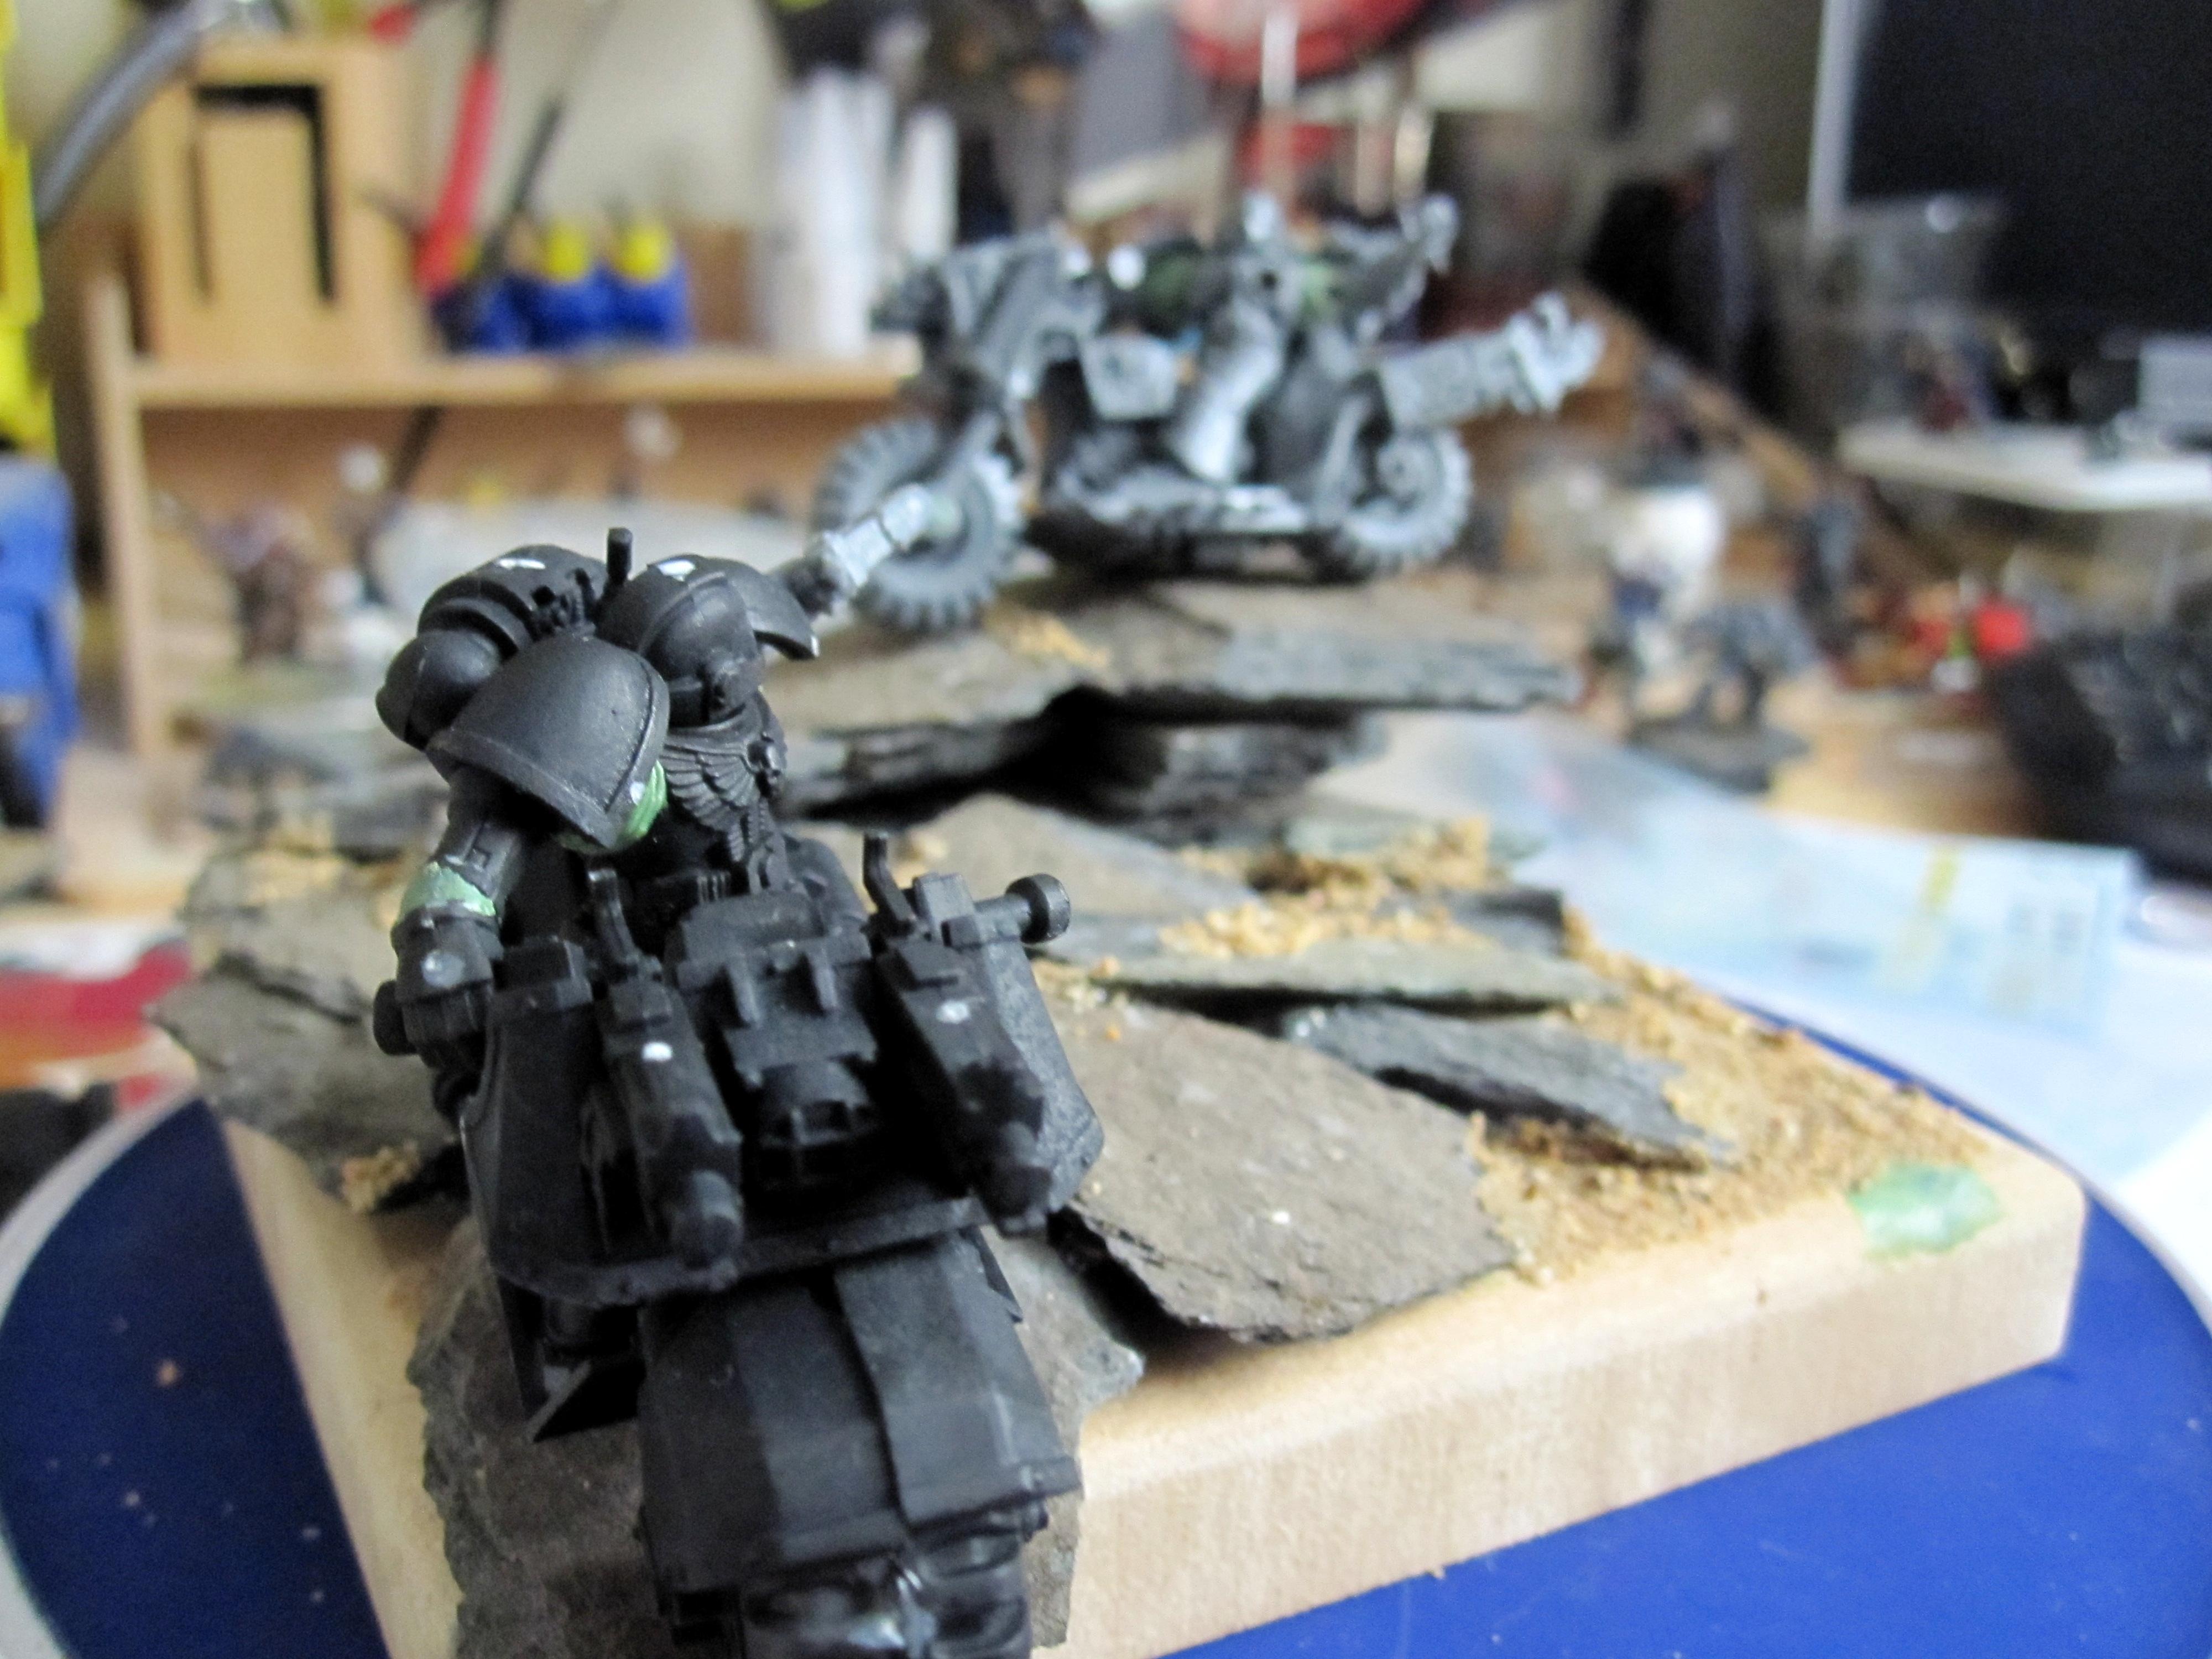 Chaos, Mini Diorama Space Marine, Warhammer 40,000, Wood, Work In Progress